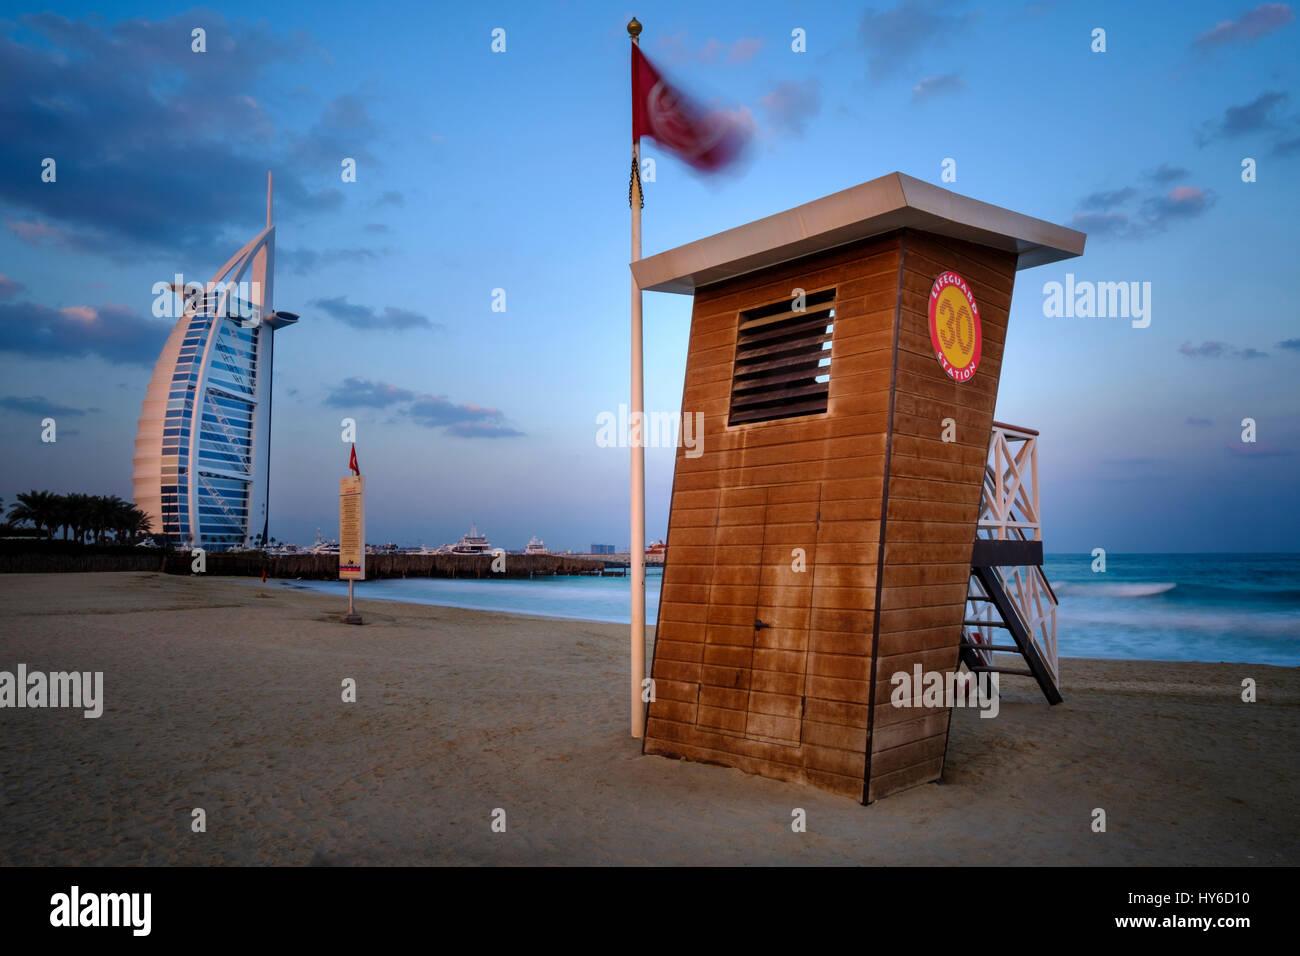 UNITED ARAB EMIRATES, DUBAI - CIRCA JANUARY 2017:  Lifeguard station at the Jumeirah Public Beach at sunrise. with - Stock Image